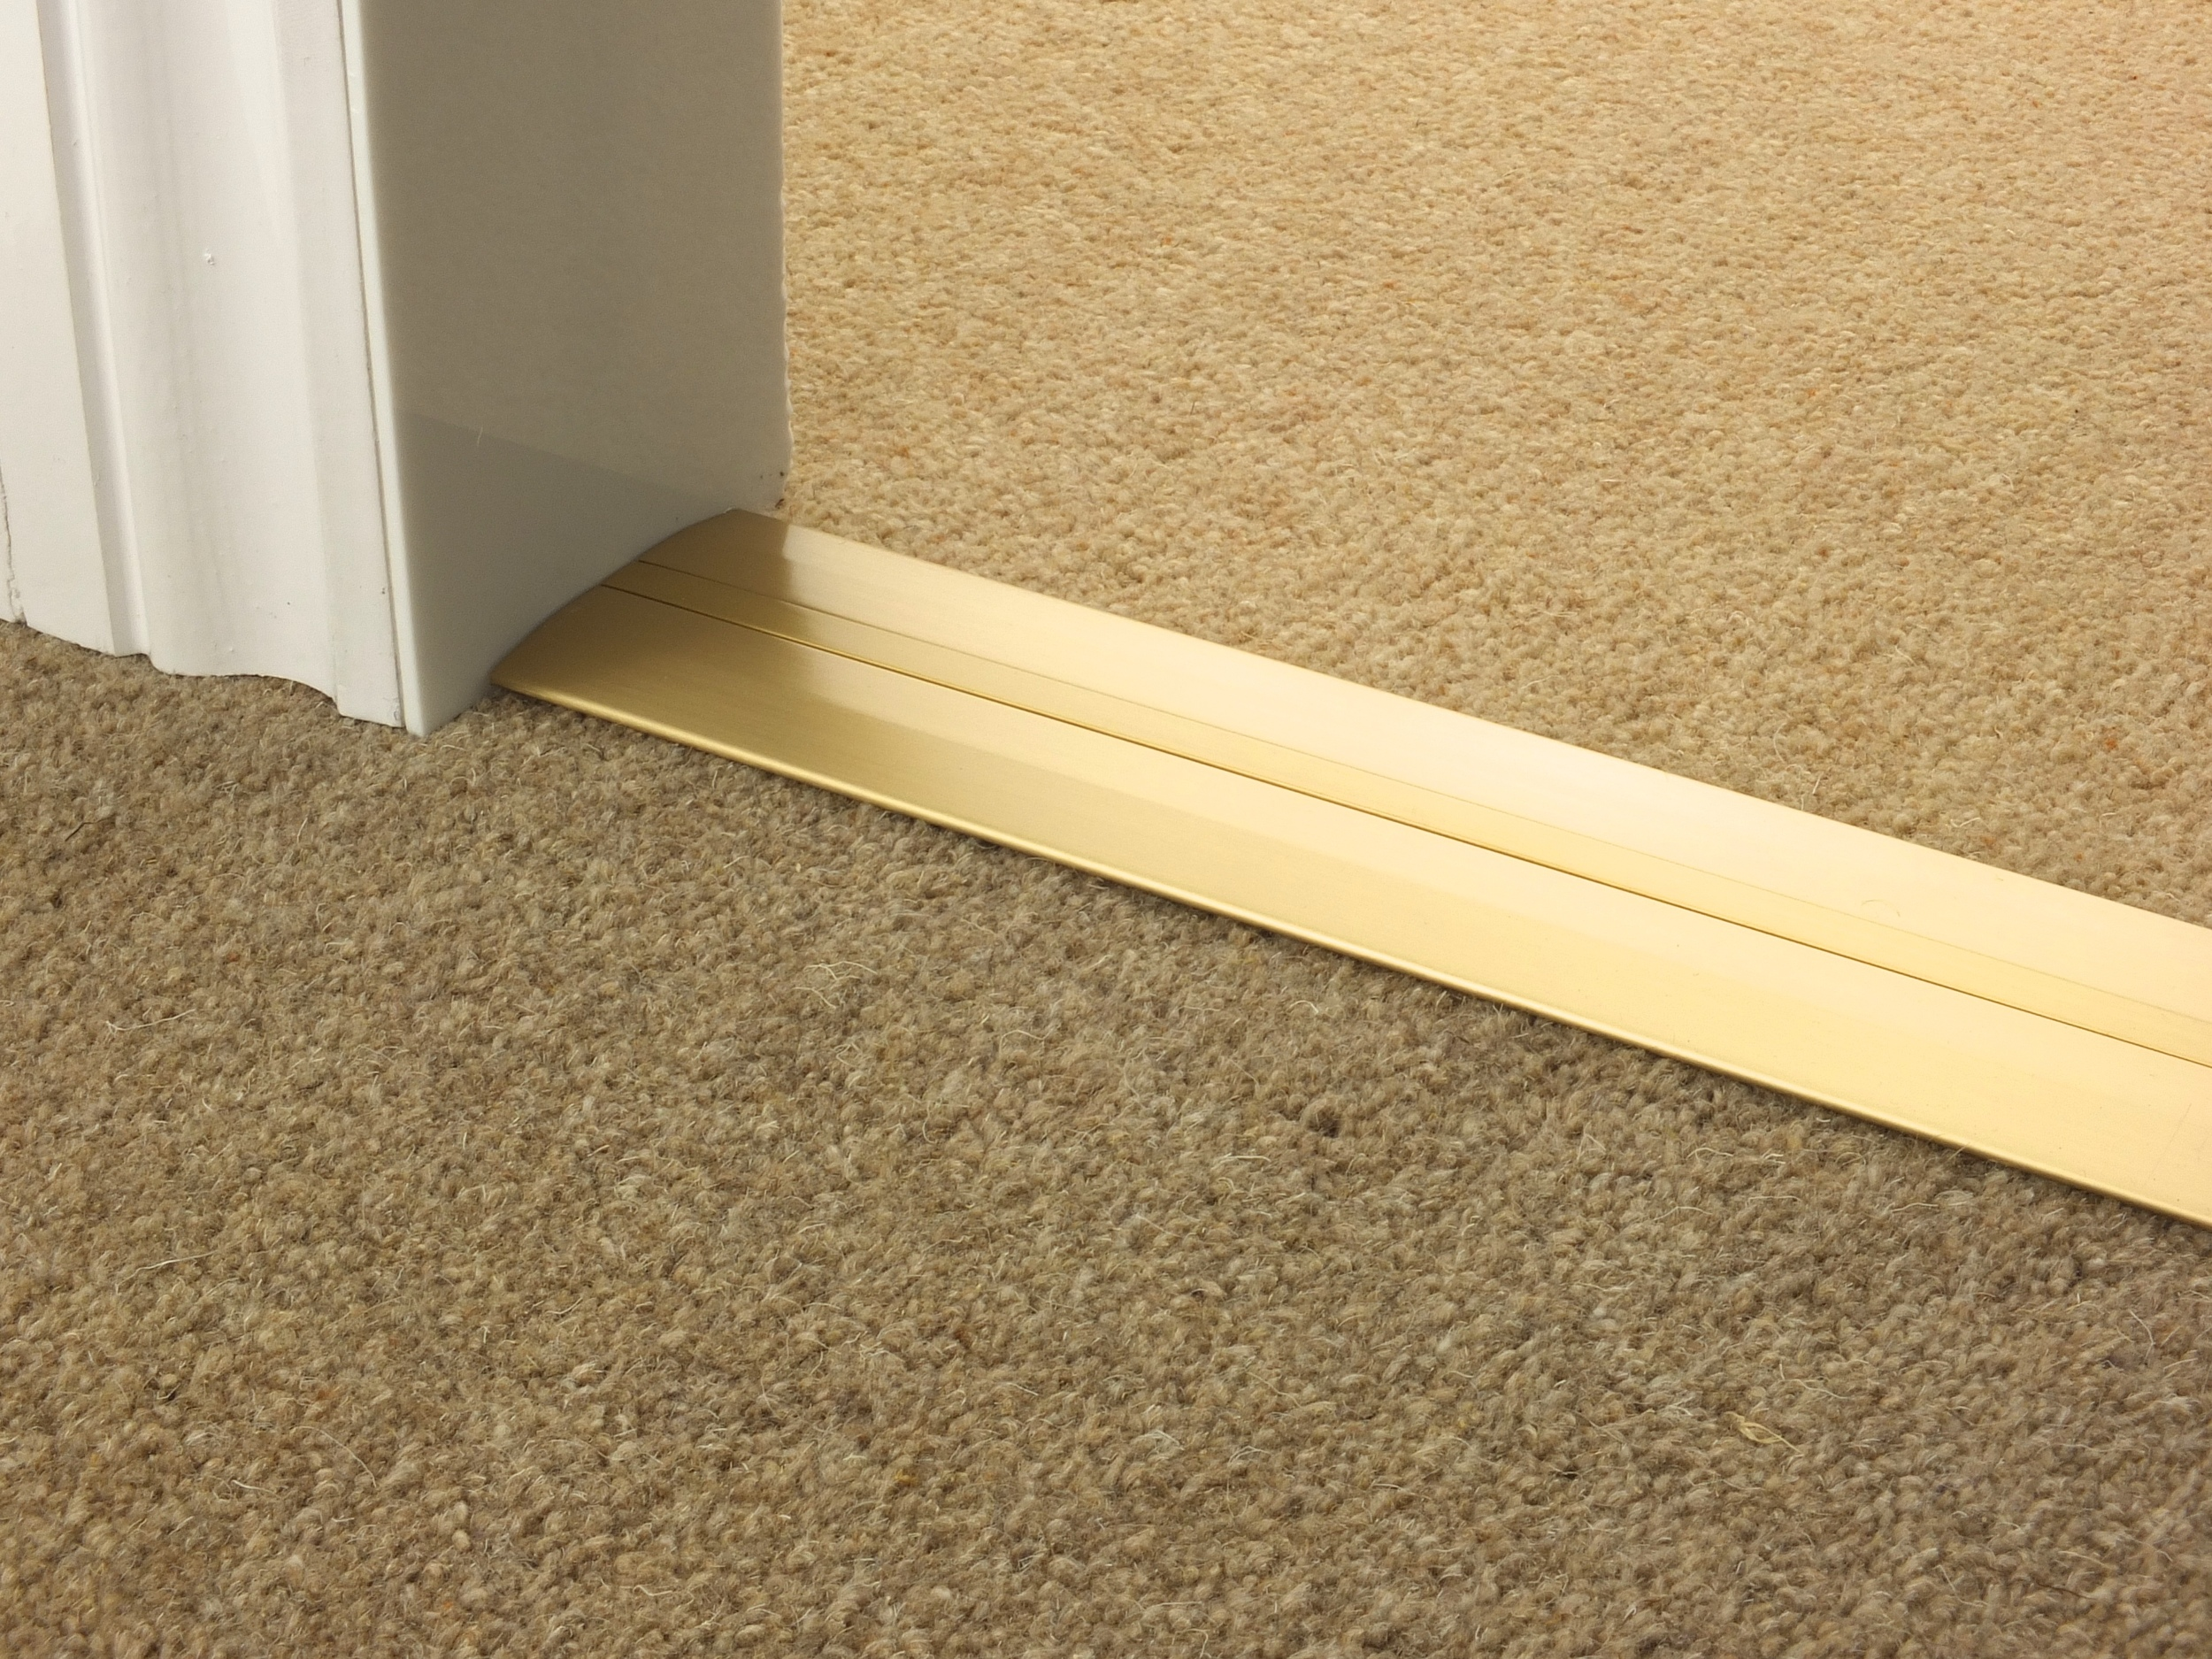 door_bar_satin_brass_posh55_carpet_carpet.jpg